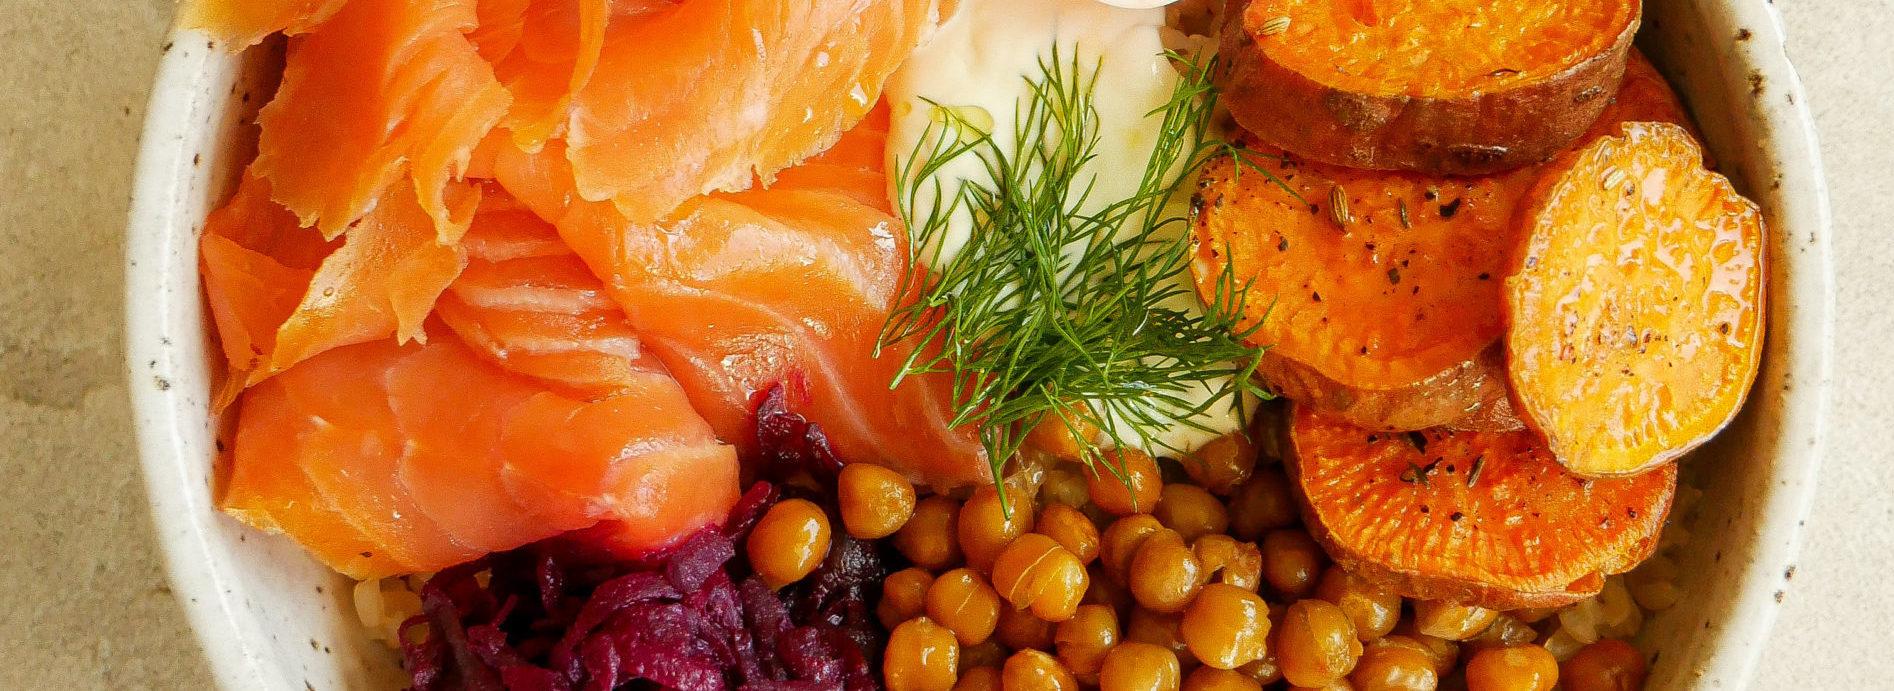 Smoked Tasmanian Salmon Lunch Bowl